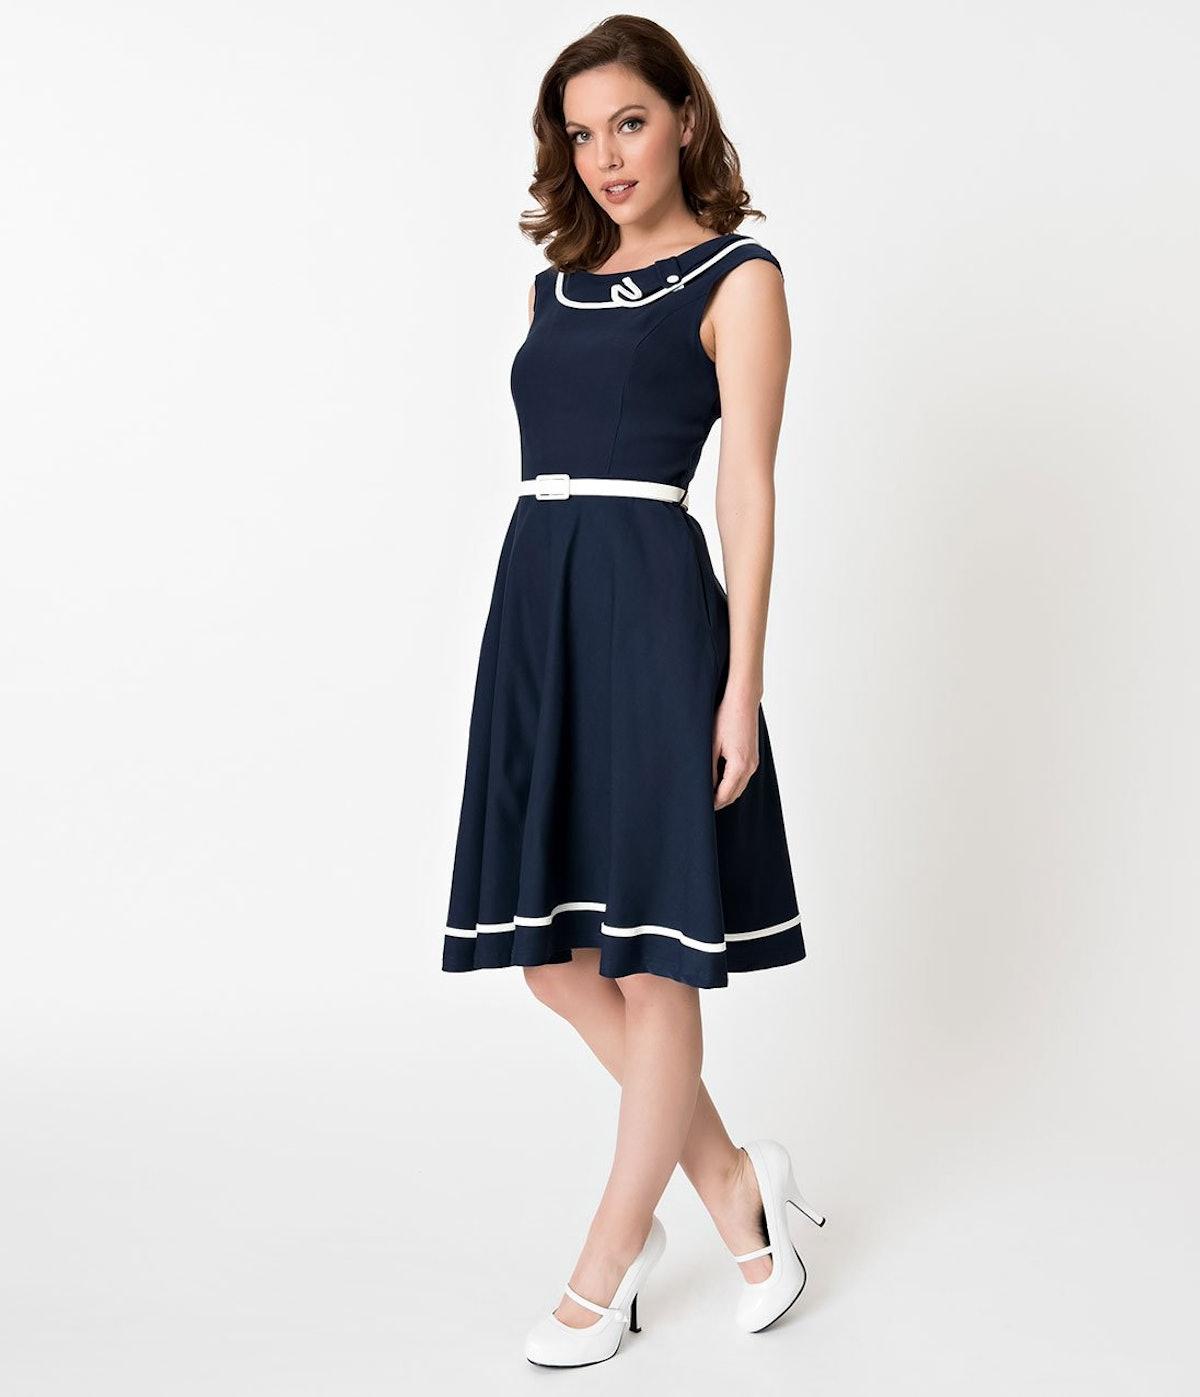 Navy Blue & White Nautical Sleeveless Cotton Stretch Swing Dress